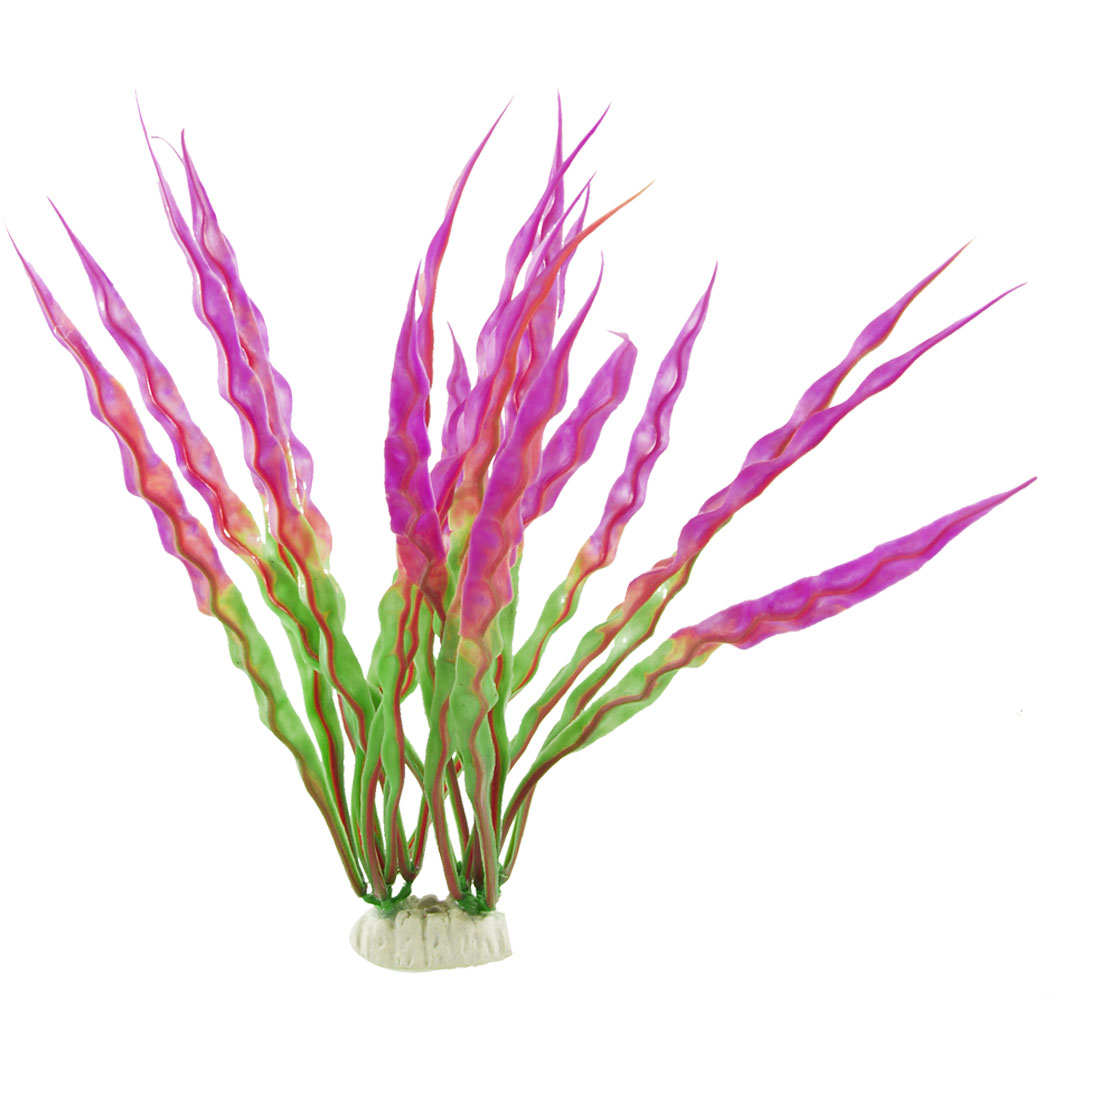 "Aquarium Purple Green 11.4"" Height Plastic Grass Plant Decor"